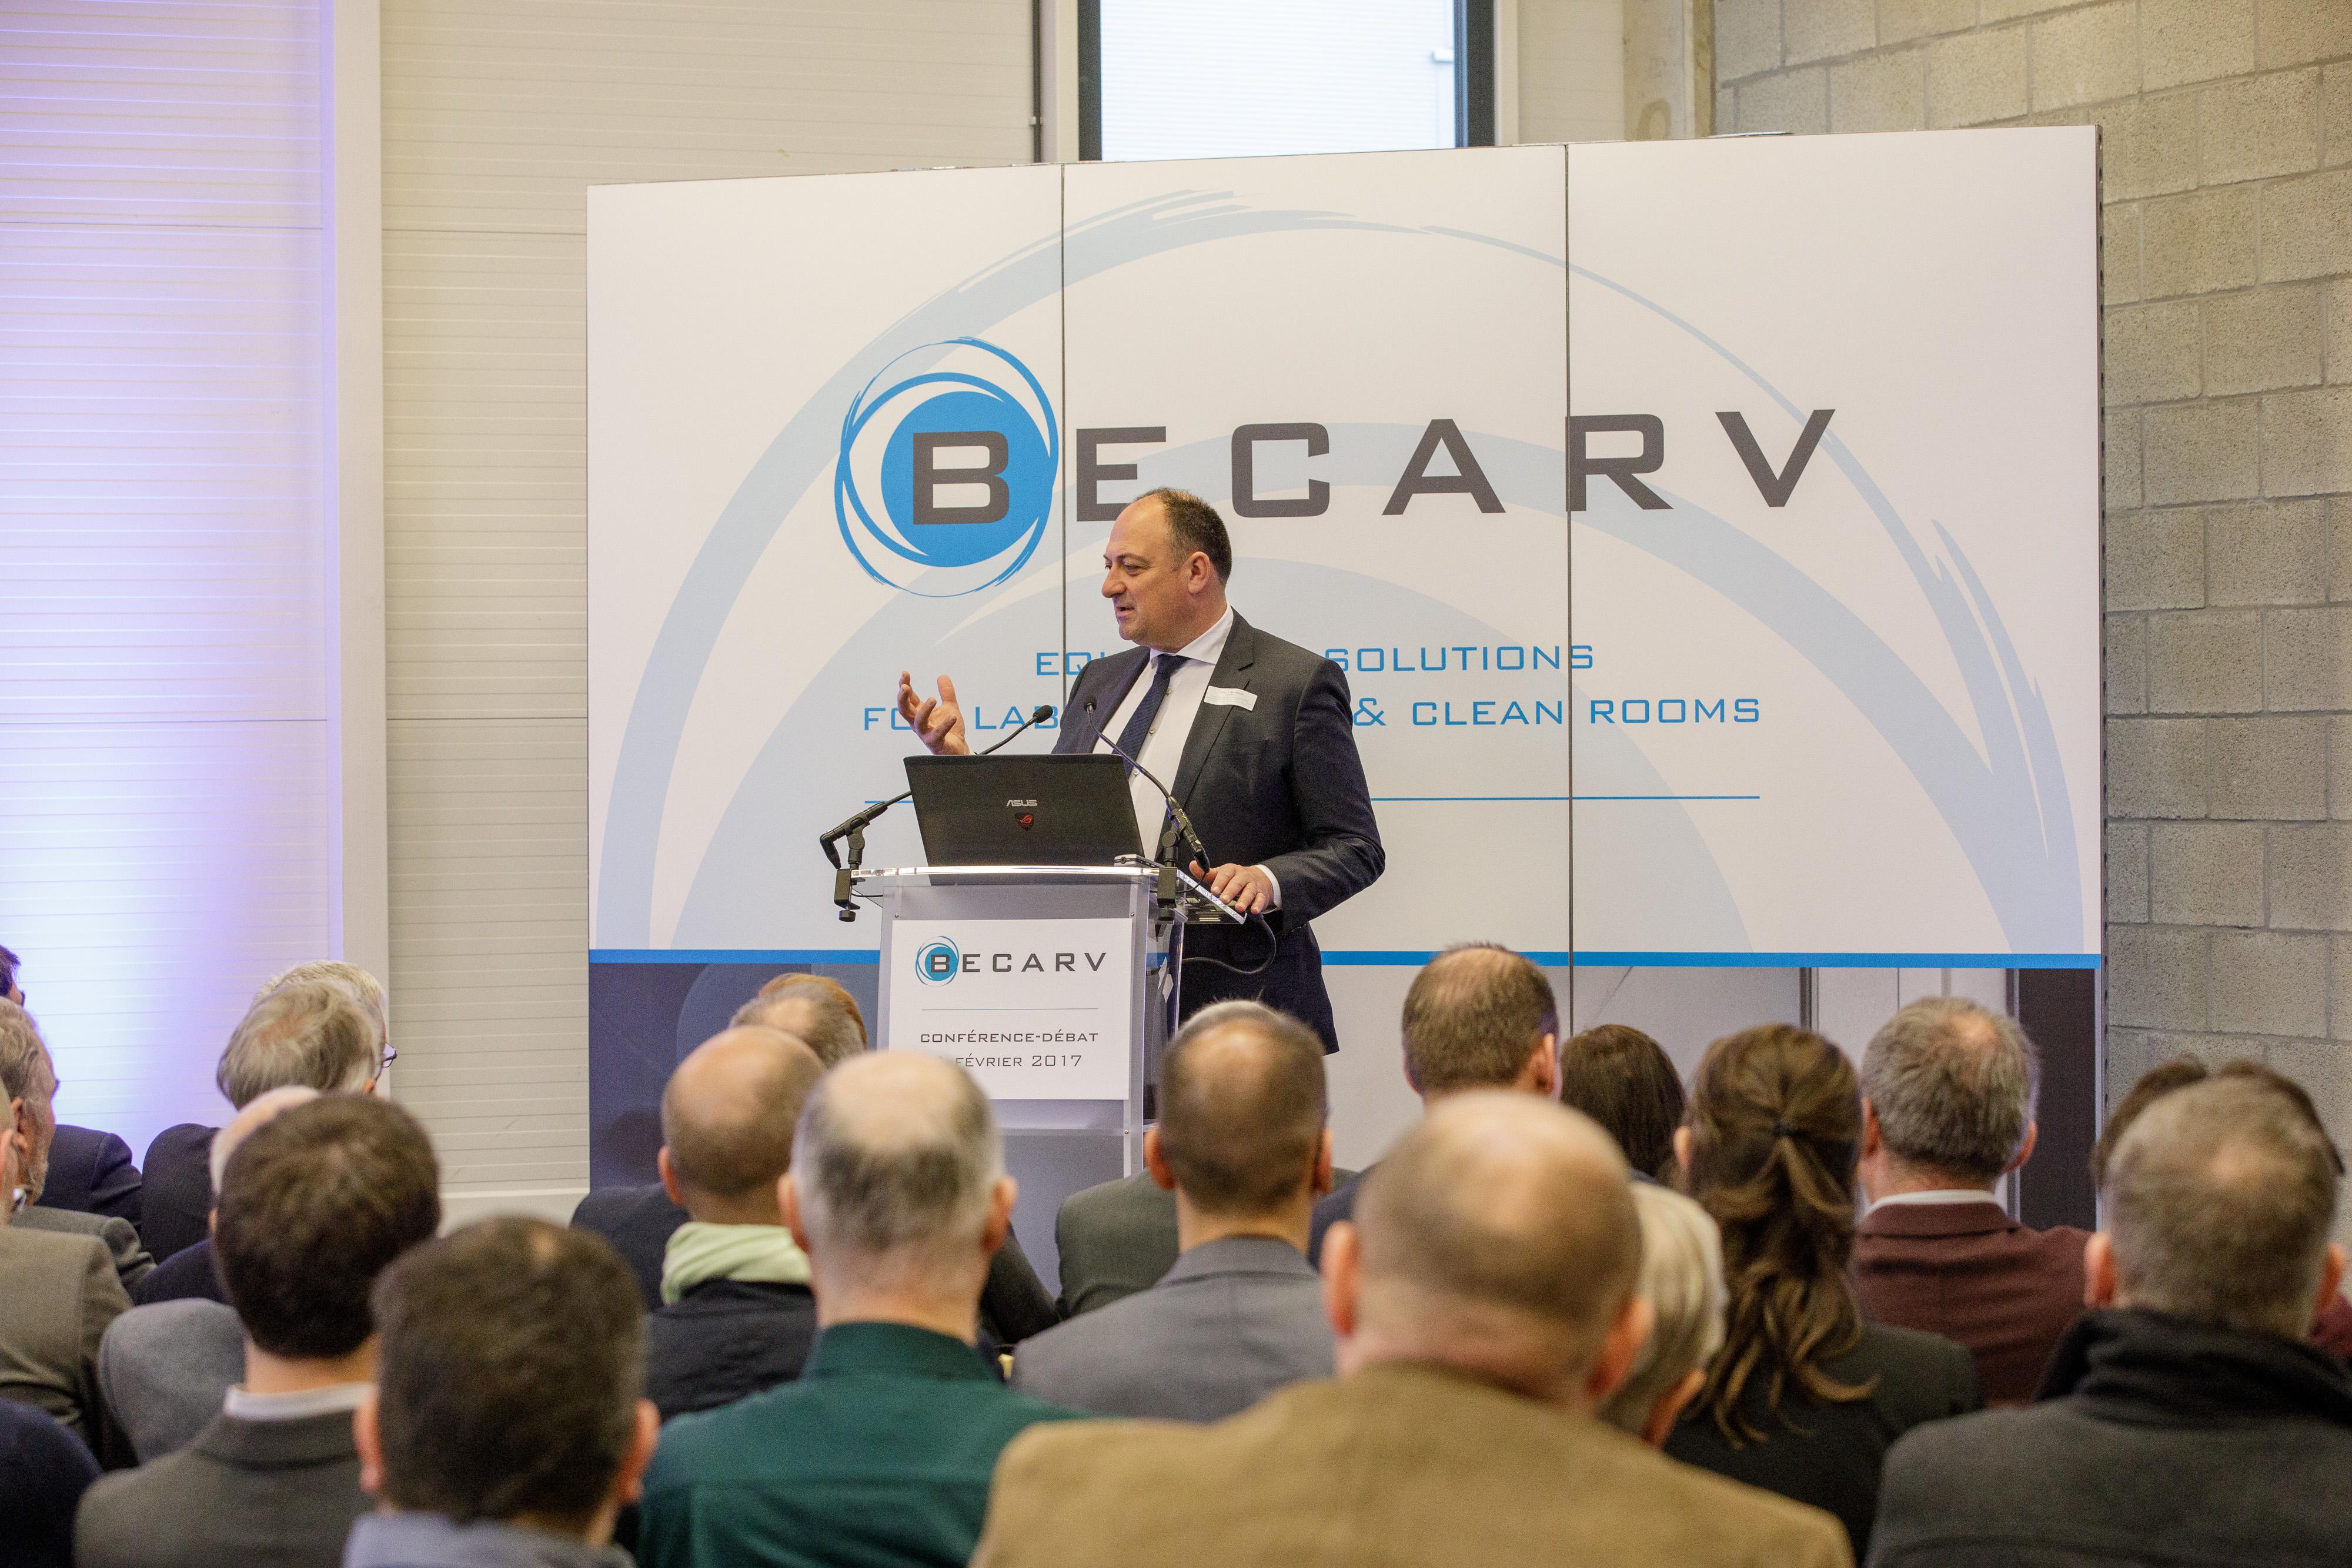 Becarv01022017_1831